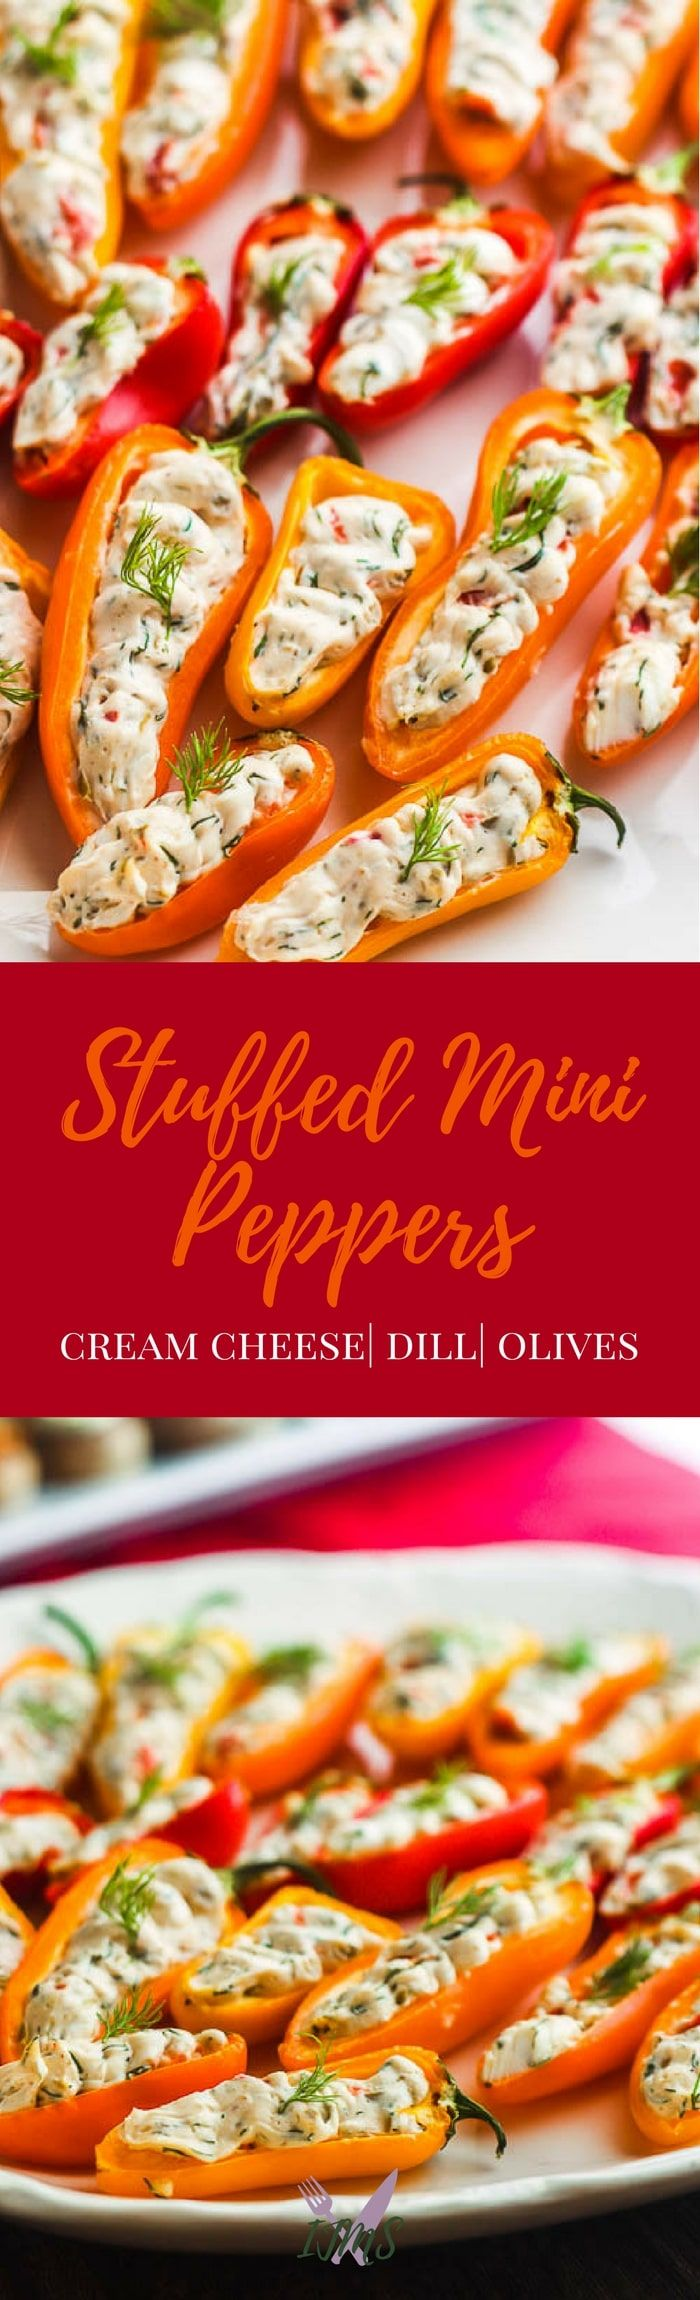 Stuffed Sweet Peppers Recipe Stuffed Peppers Stuffed Sweet Peppers Appetizer Recipes